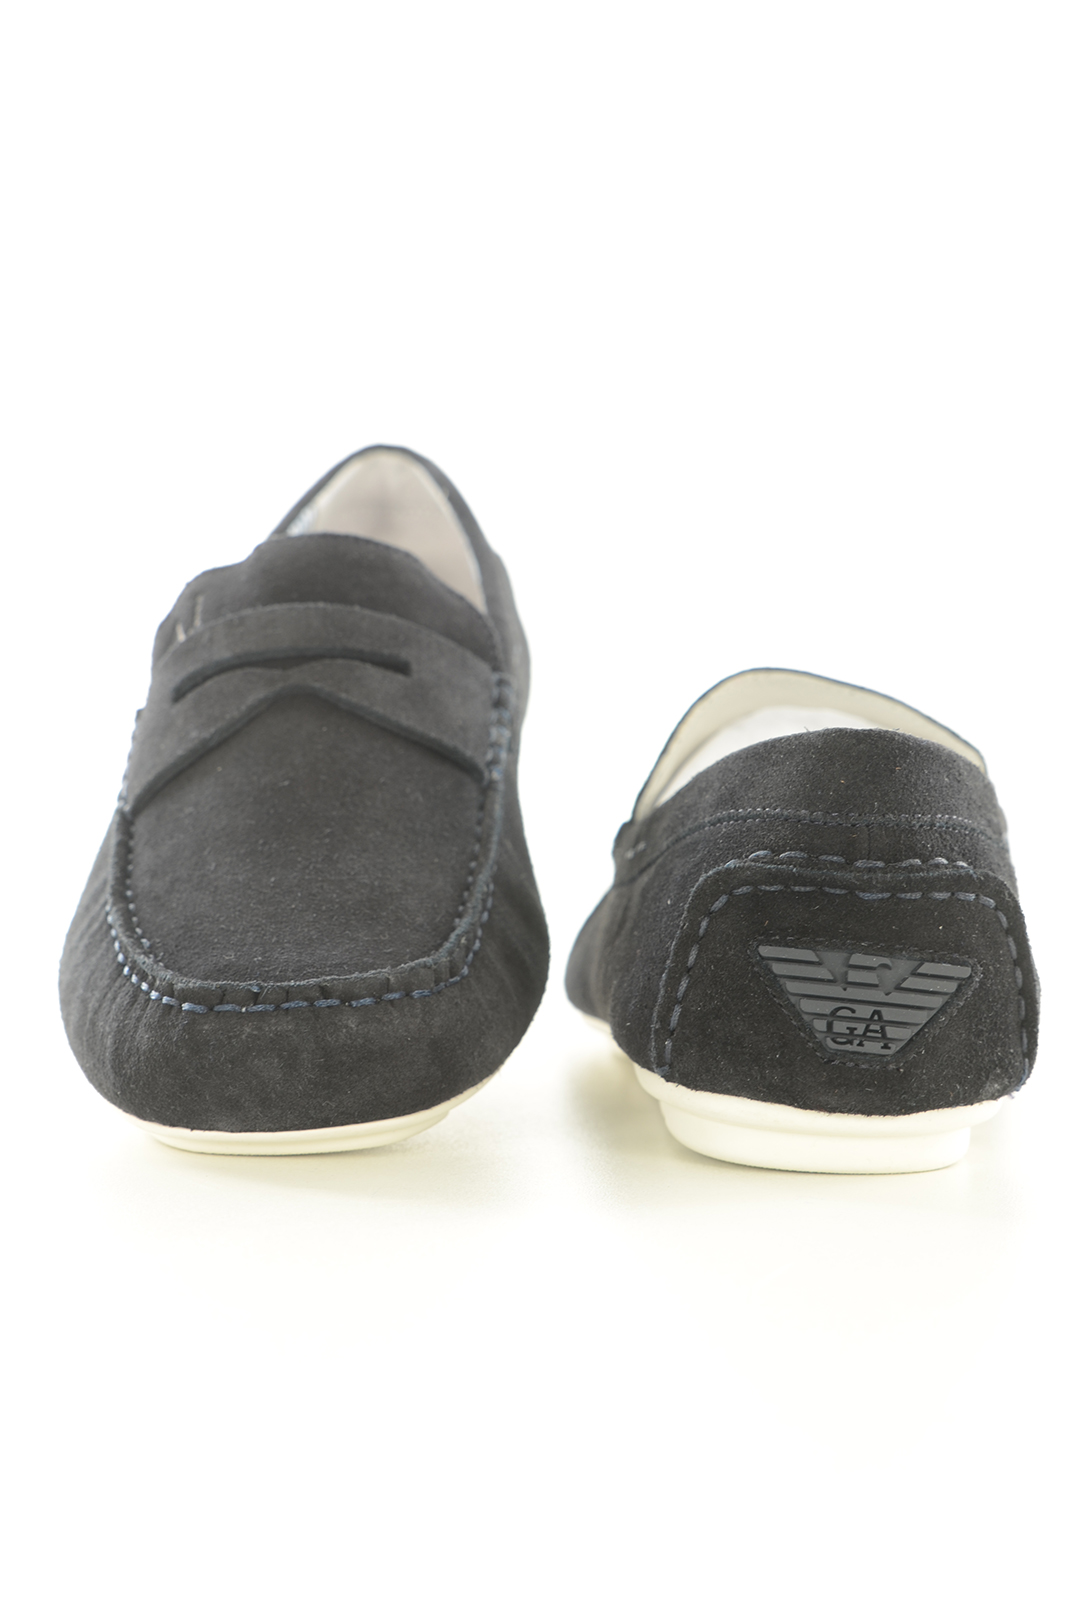 Chaussures   Armani jeans 06588 55 Y5 BLUE/BLACK